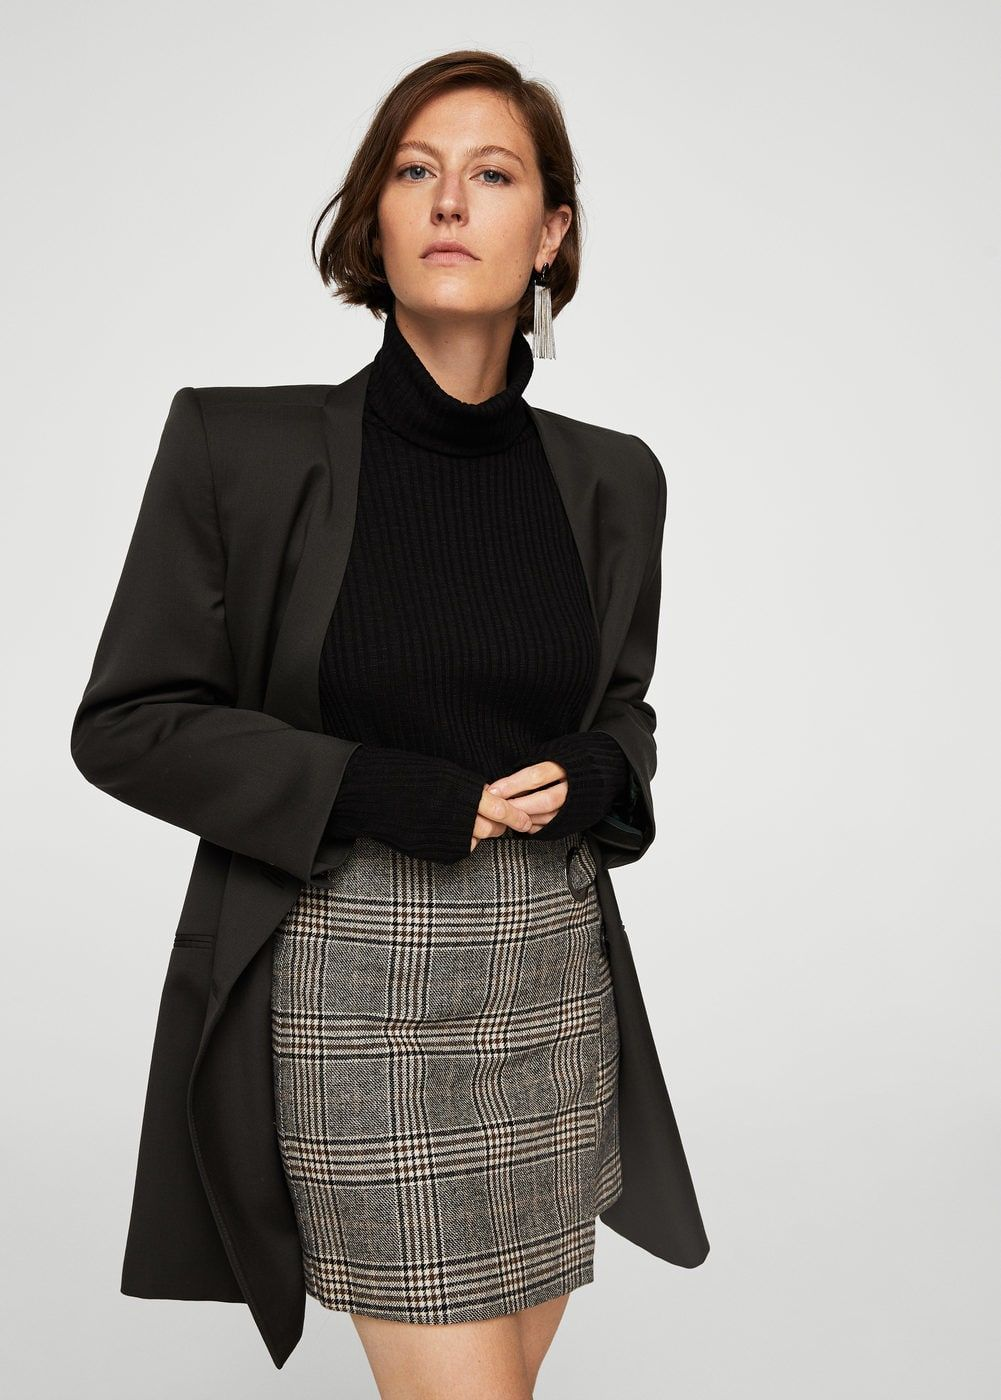 8202dab78 Wool boots skirt - Women en 2019 | clothez/inspo | Falda corta a ...